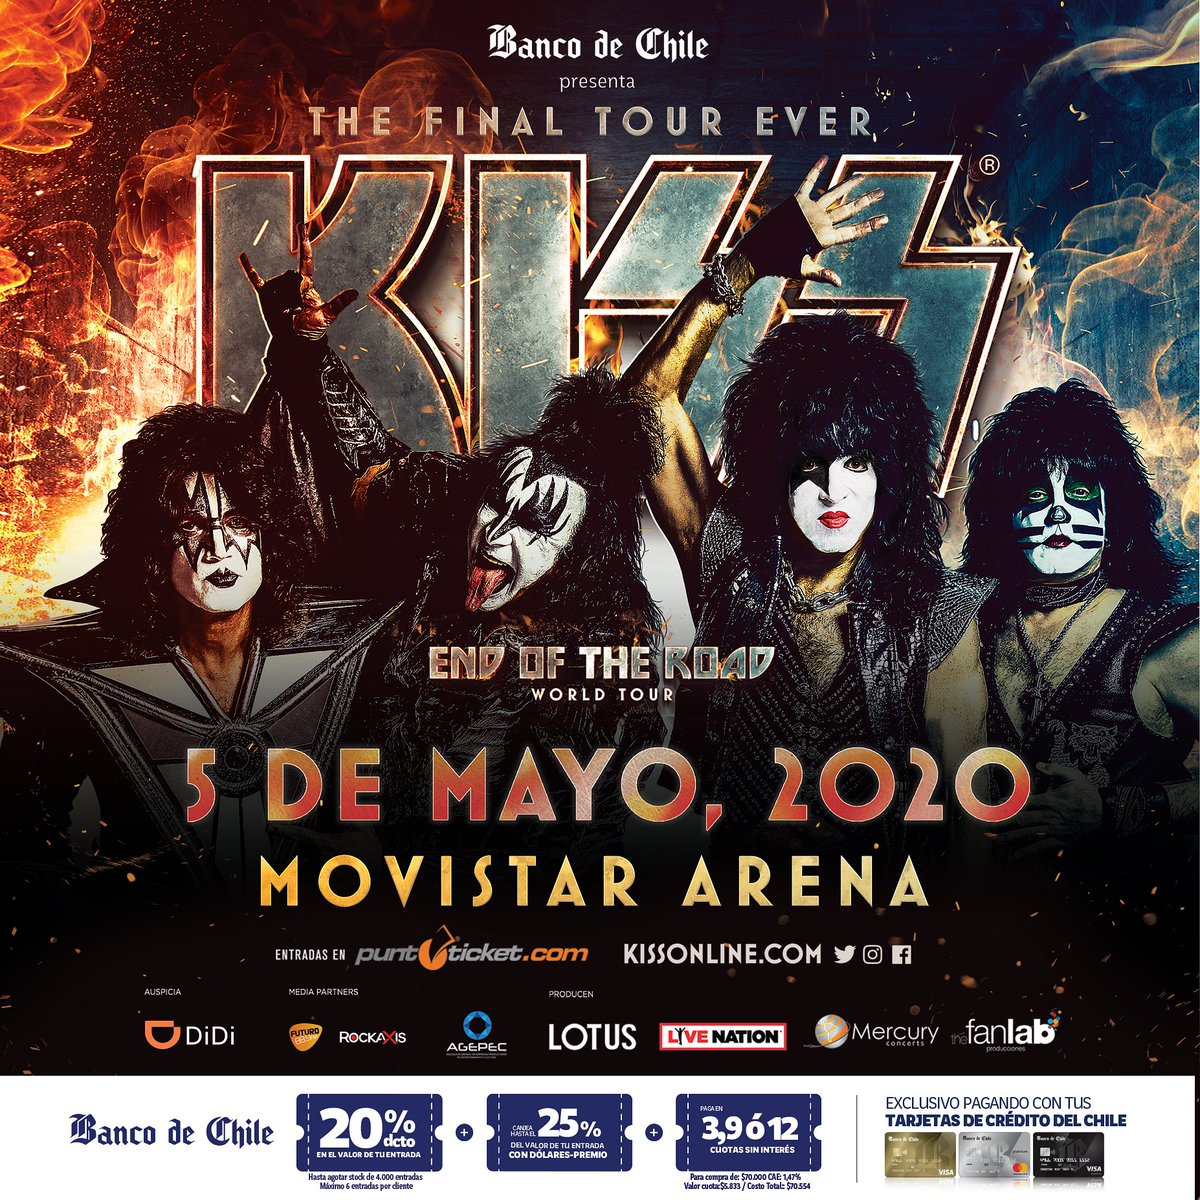 Que sea un Excelente y Feliz día KiSSeros!! #Kiss #thefinaltourever #endoftheroad #kissonline #kissband #kissmusic #kissarmy #kissnation #kissfan #kissforever #rock #rocknroll  #liveconcerts #concierto #conciertoschile #kissenchile #kissenchile2020 #youwantthebest #KissArmyCLpic.twitter.com/qCMwr6gRzl